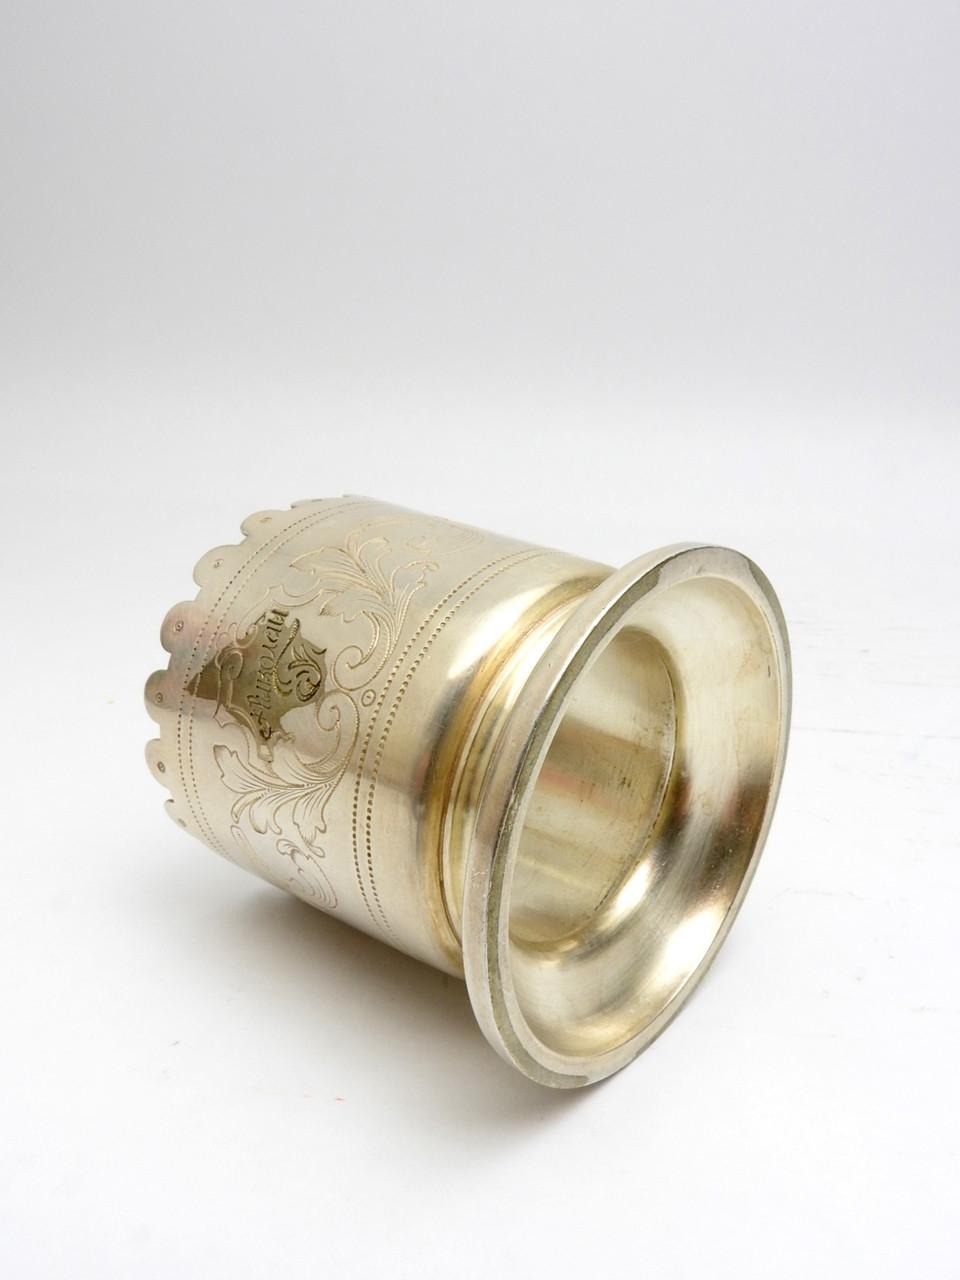 Antique Austria-Hungarian Empire Tea Glass Holder